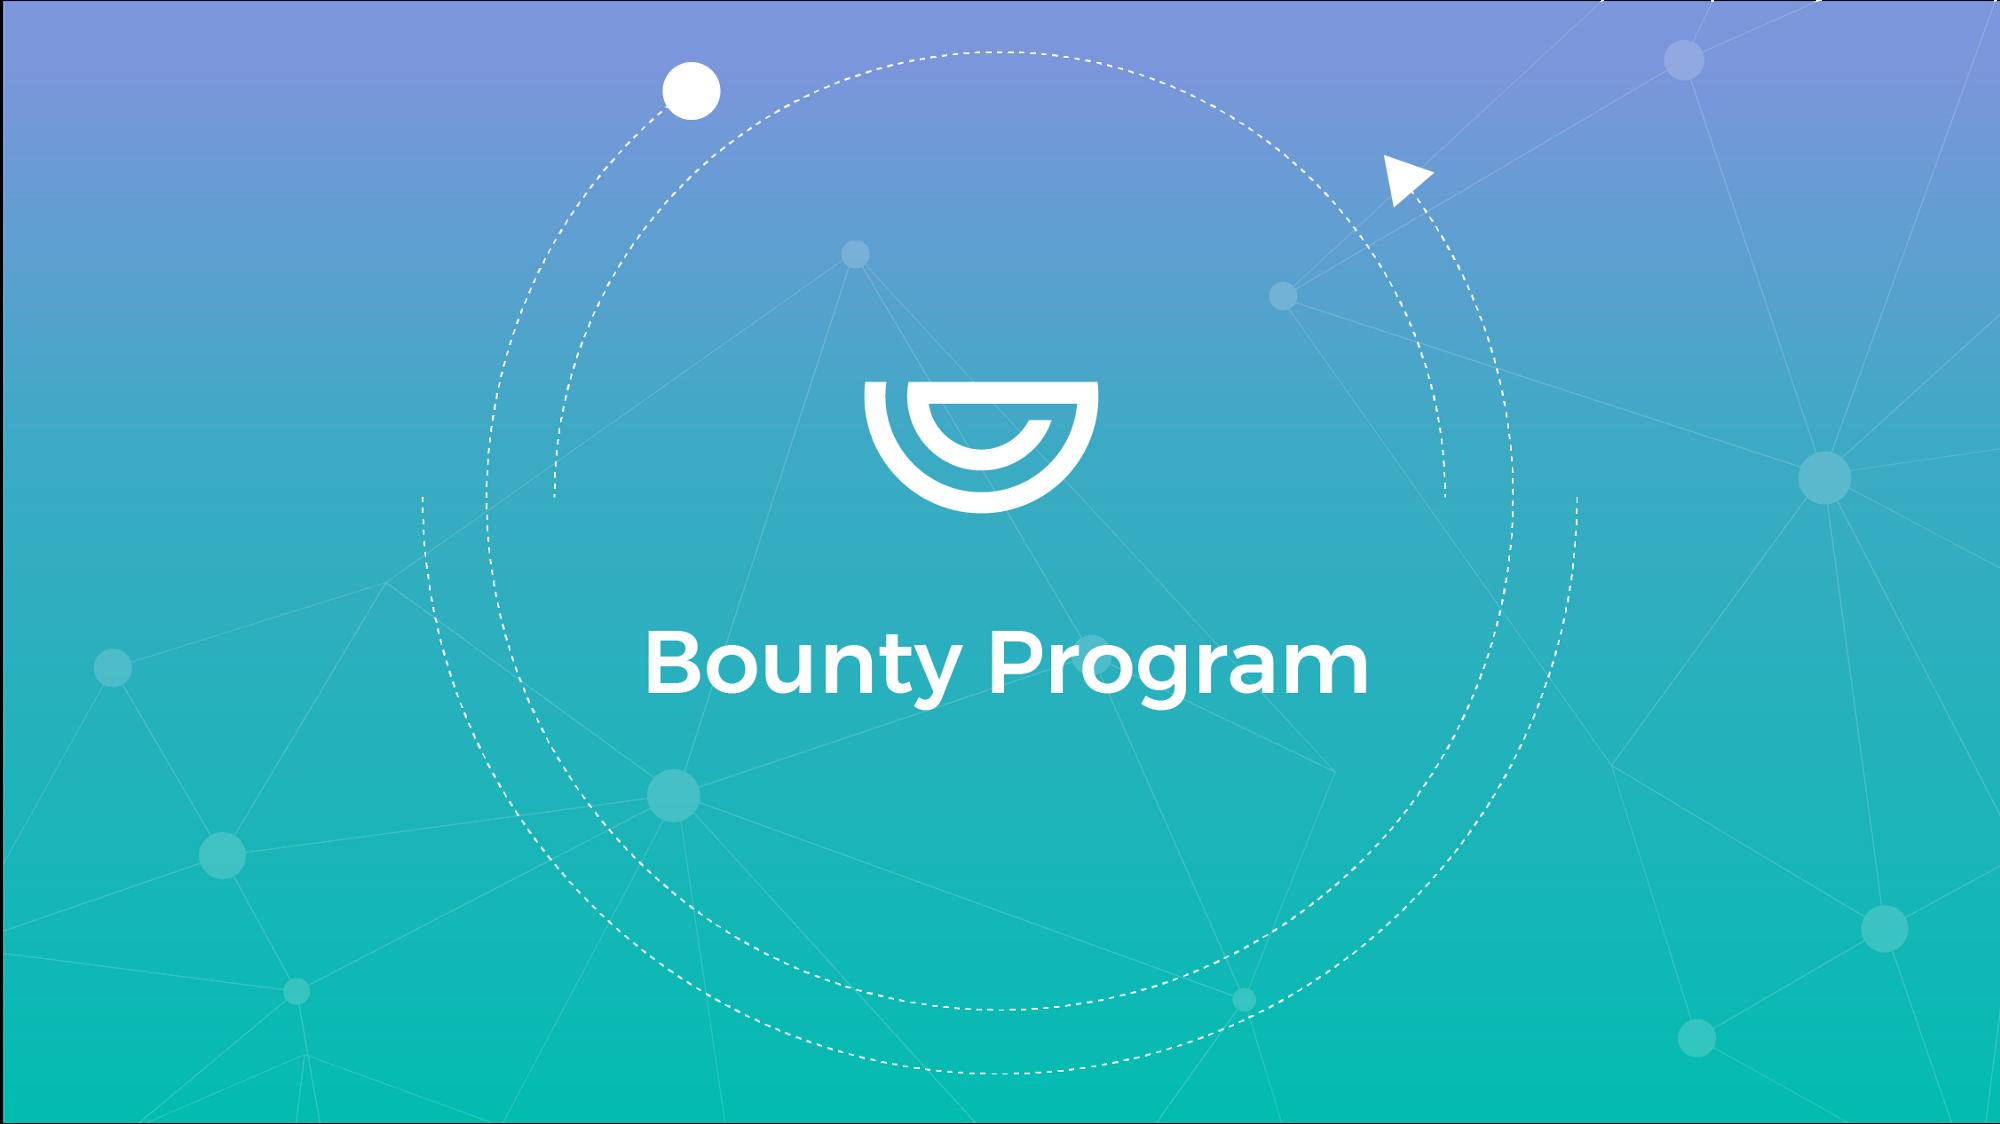 Creation of ICO Bounty Programs